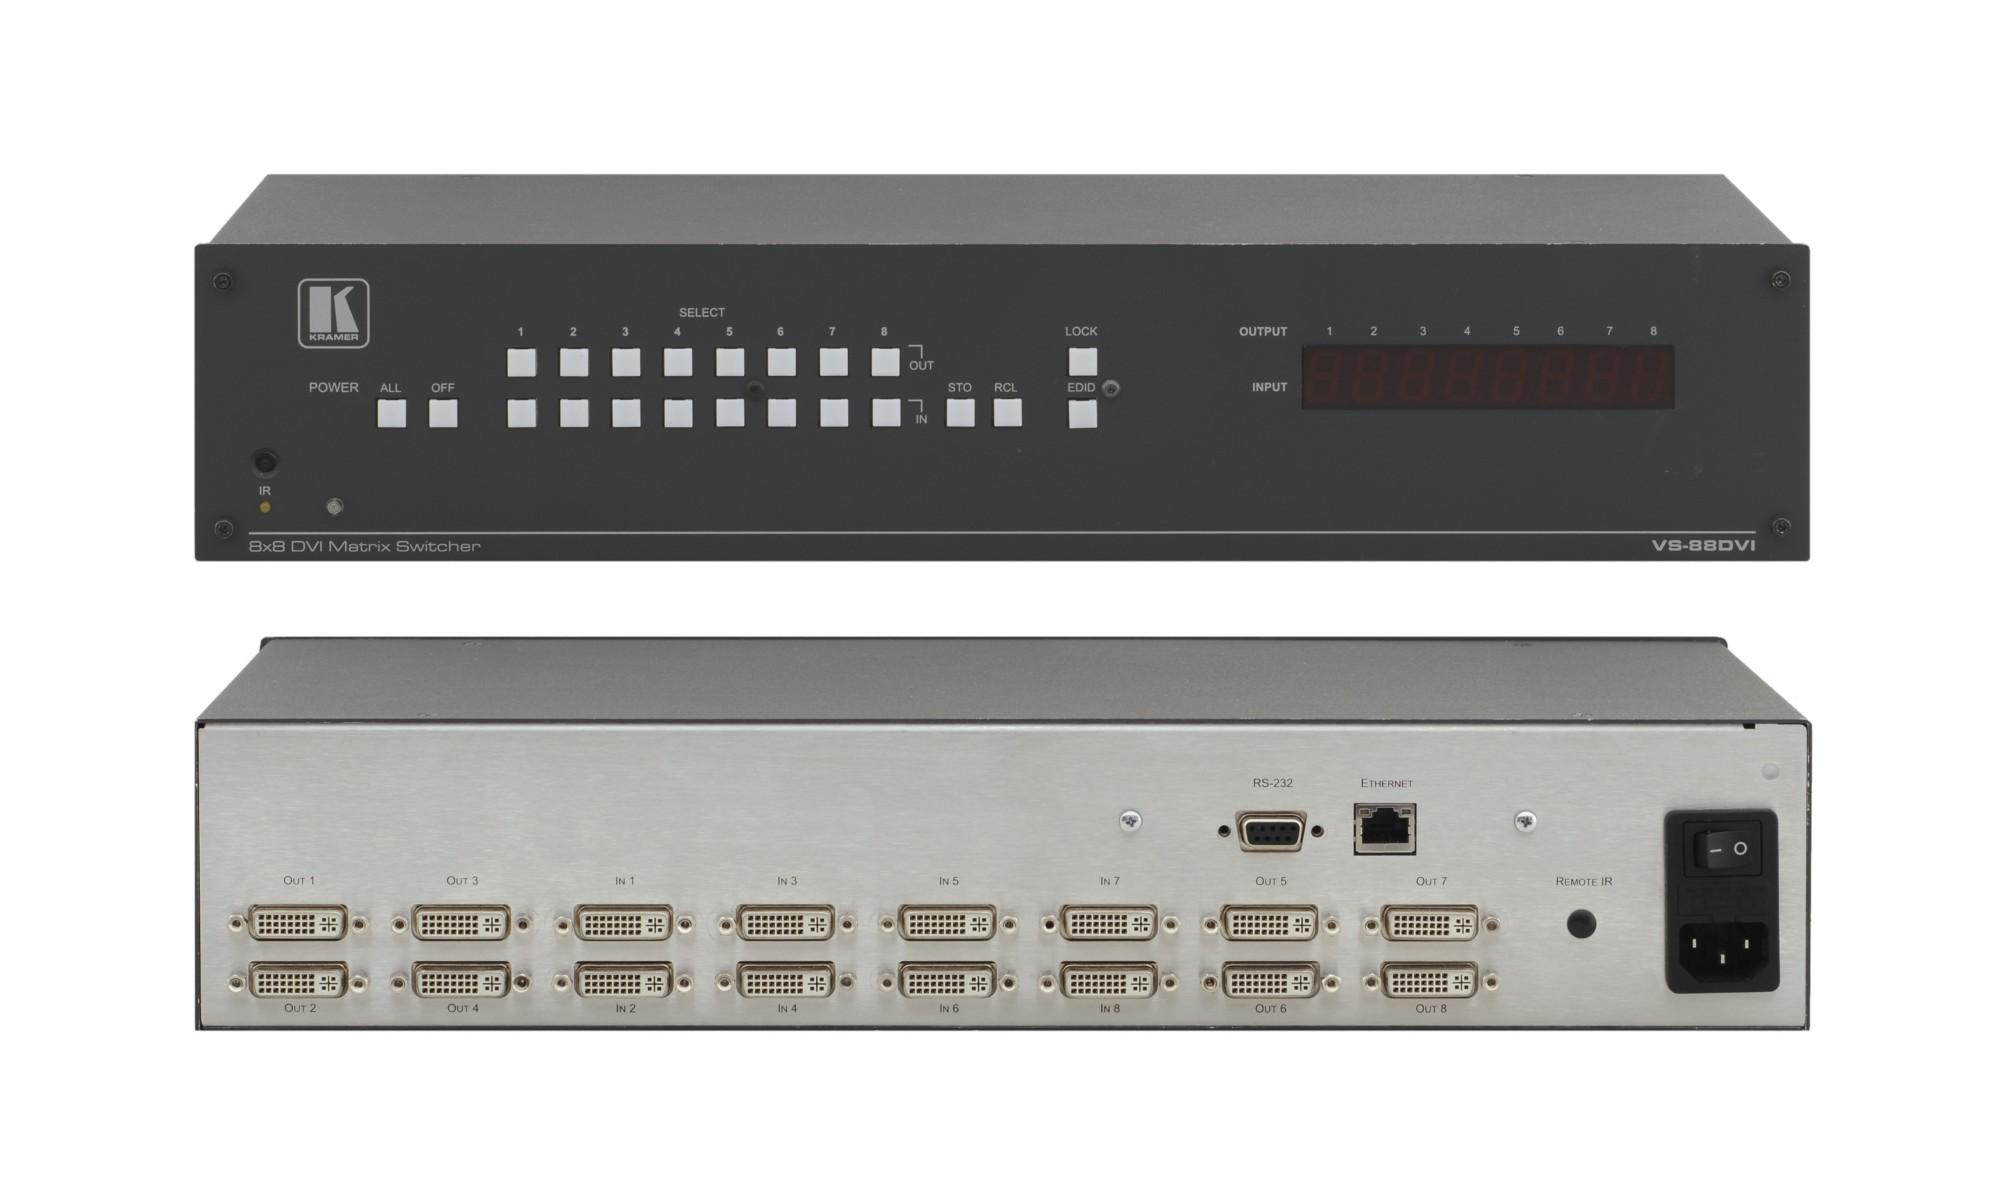 Kramer Electronics VS-88DVI DVI video switch